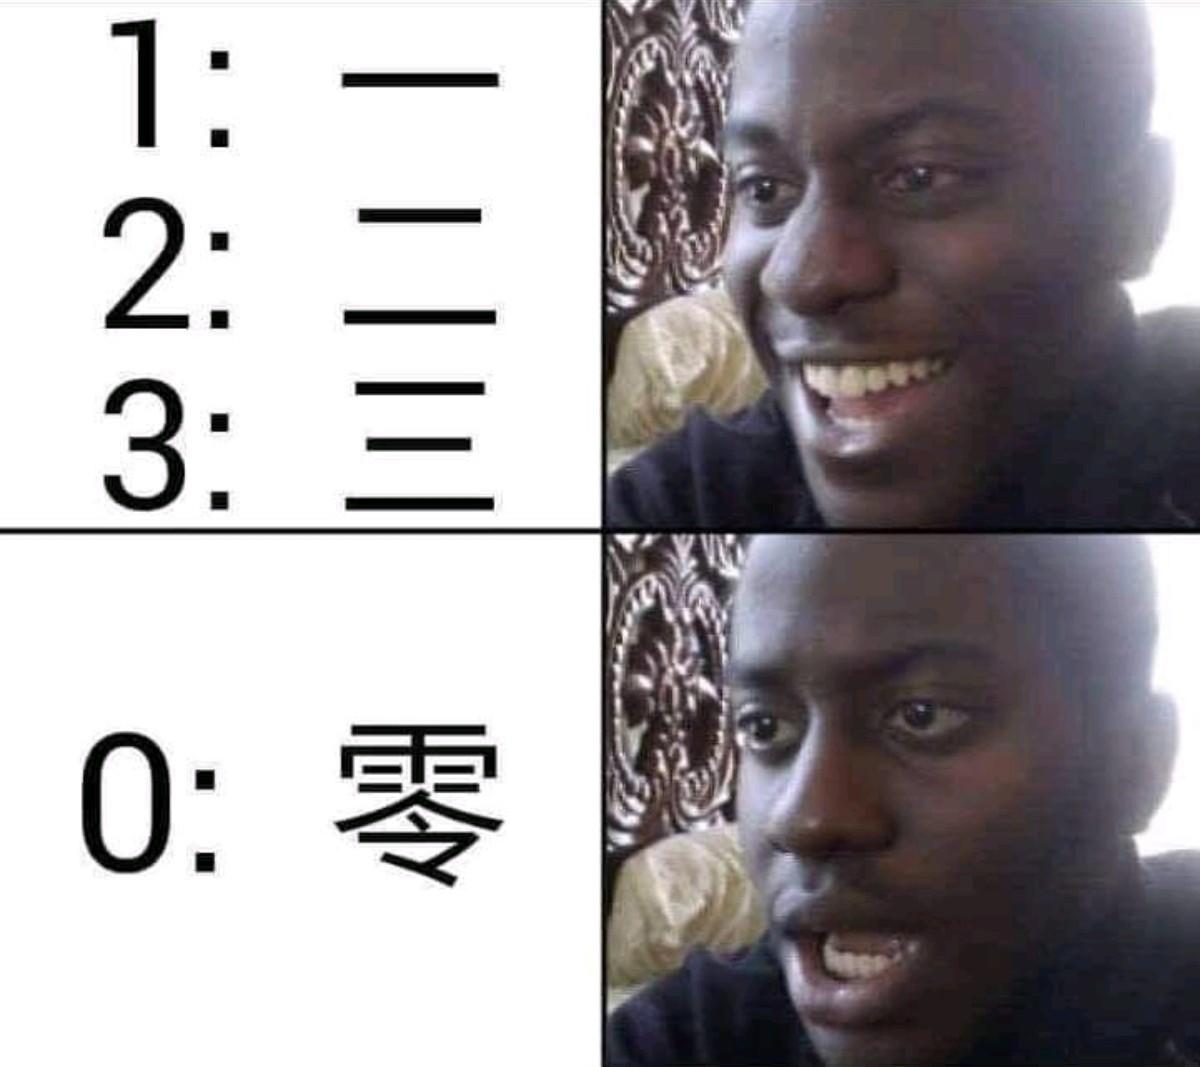 Aprender chino.... - meme